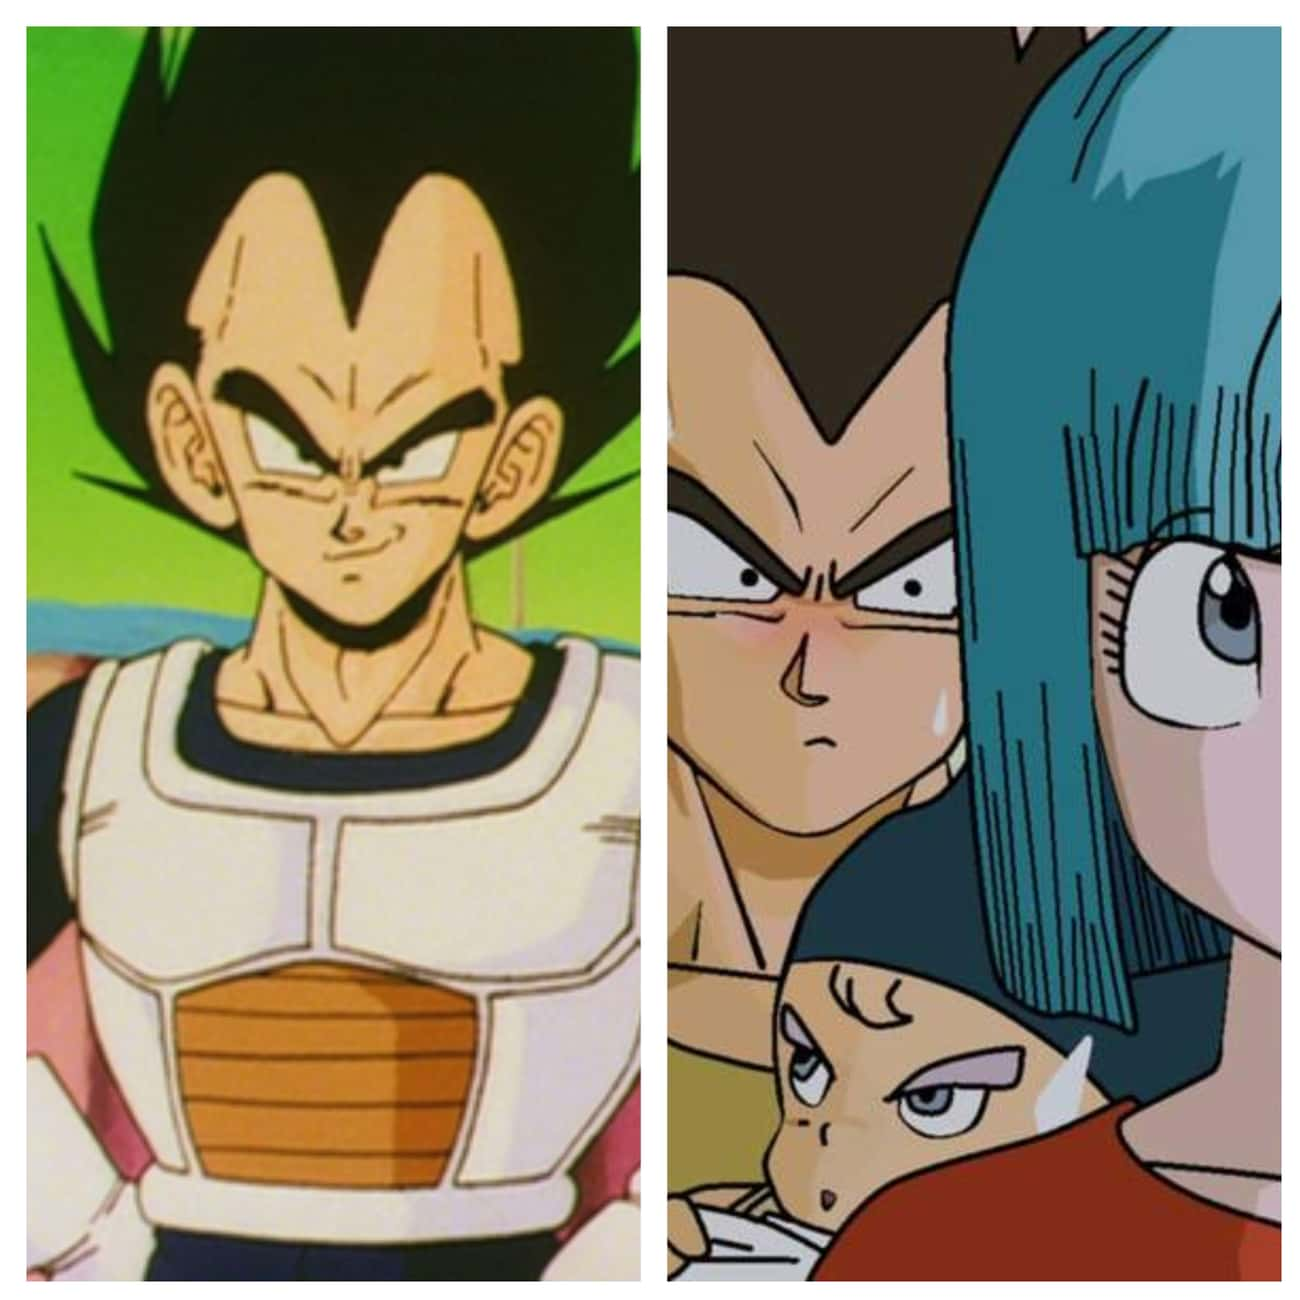 Vegeta Goes From Villain To Family Man In 'Dragon Ball Z'